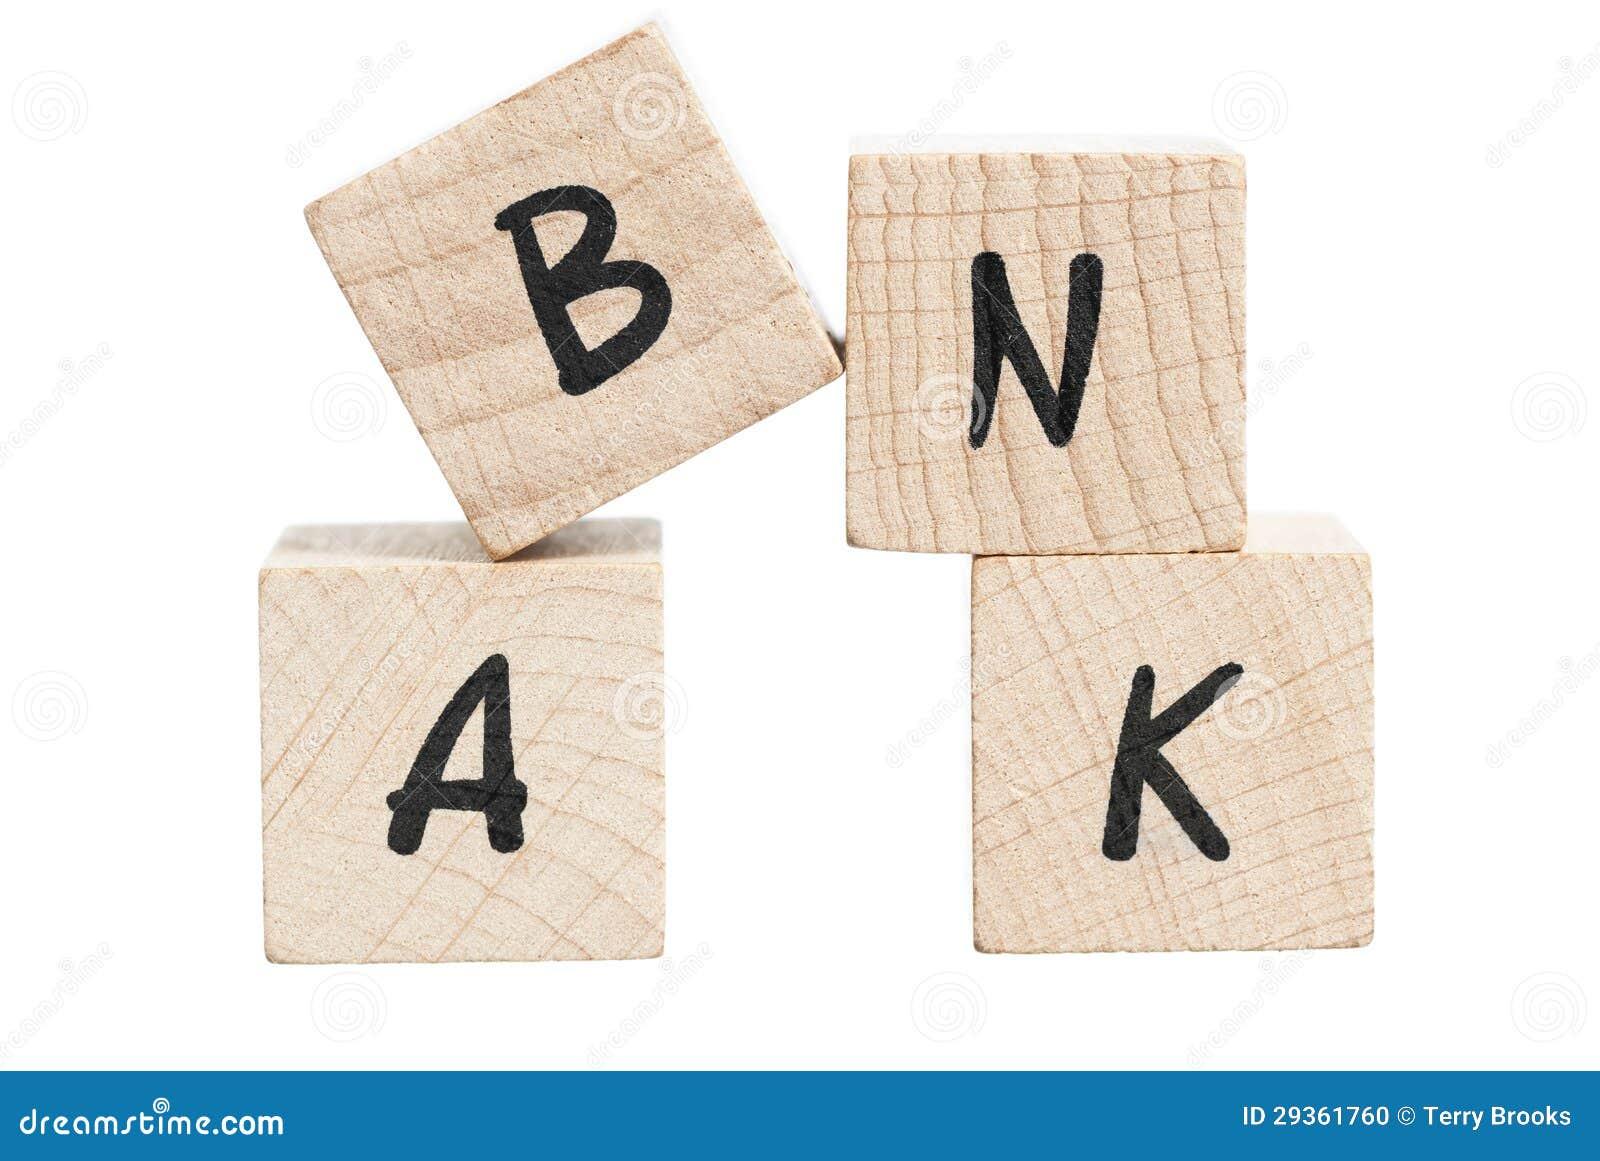 Word bank written with wooden blocks stock photo image 29361760 royalty free stock photo buycottarizona Images